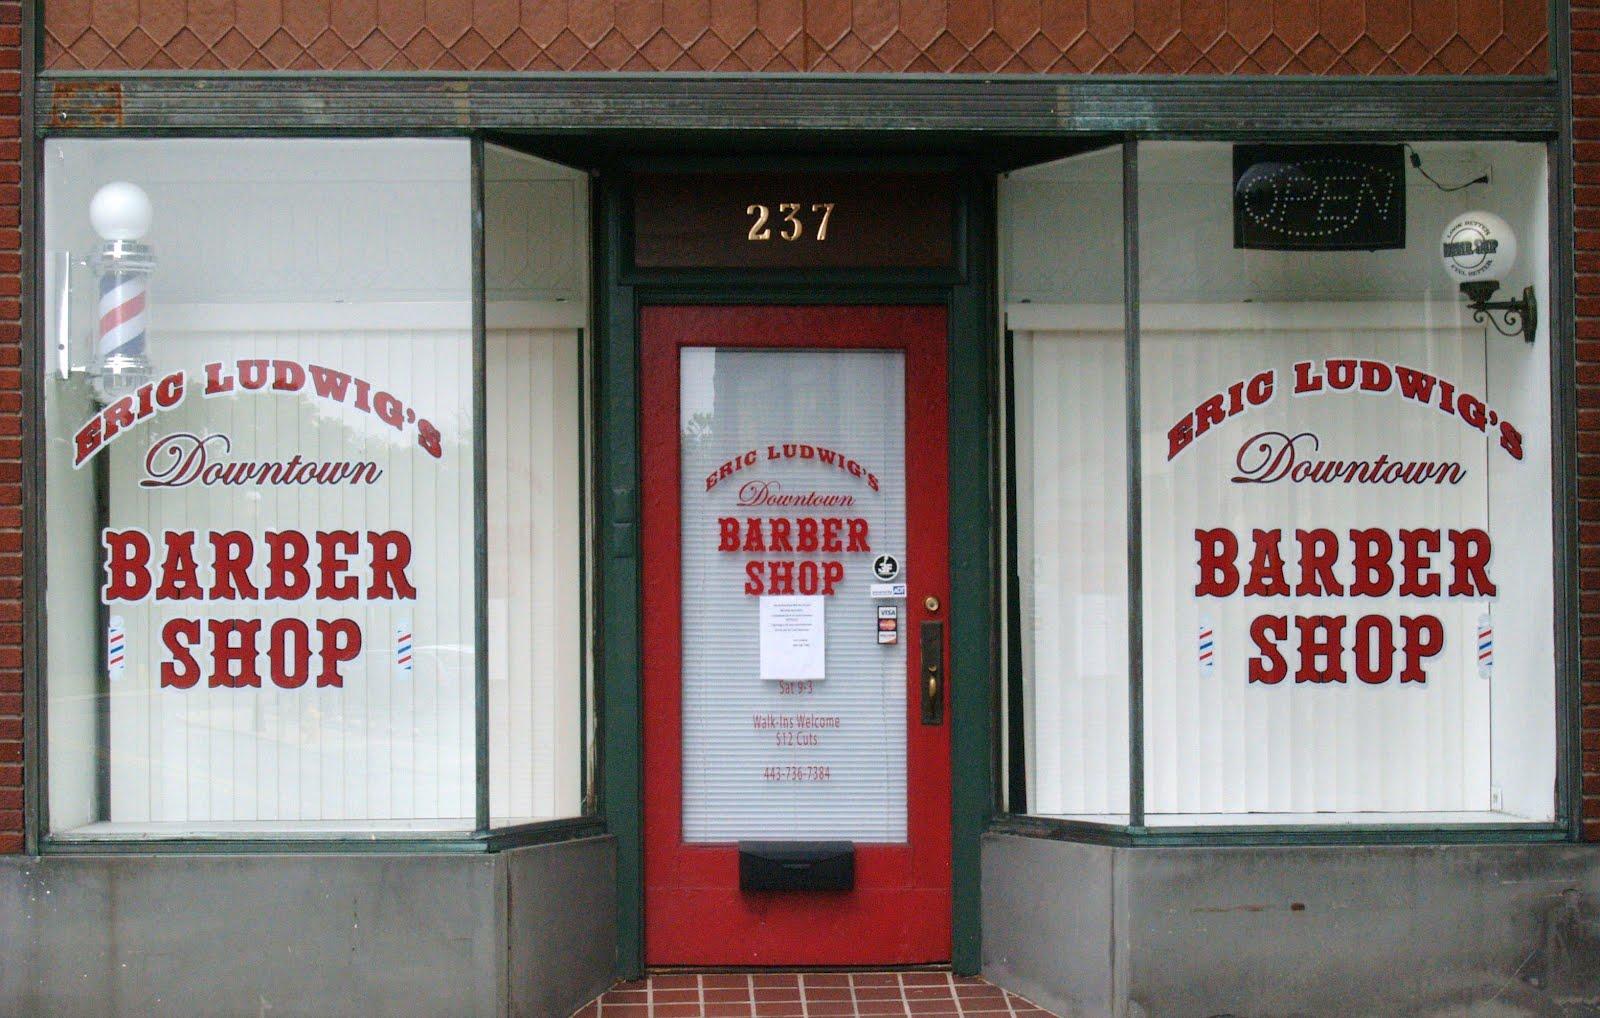 Salisbury News: Erics Barber Shop Will Be Closed Today